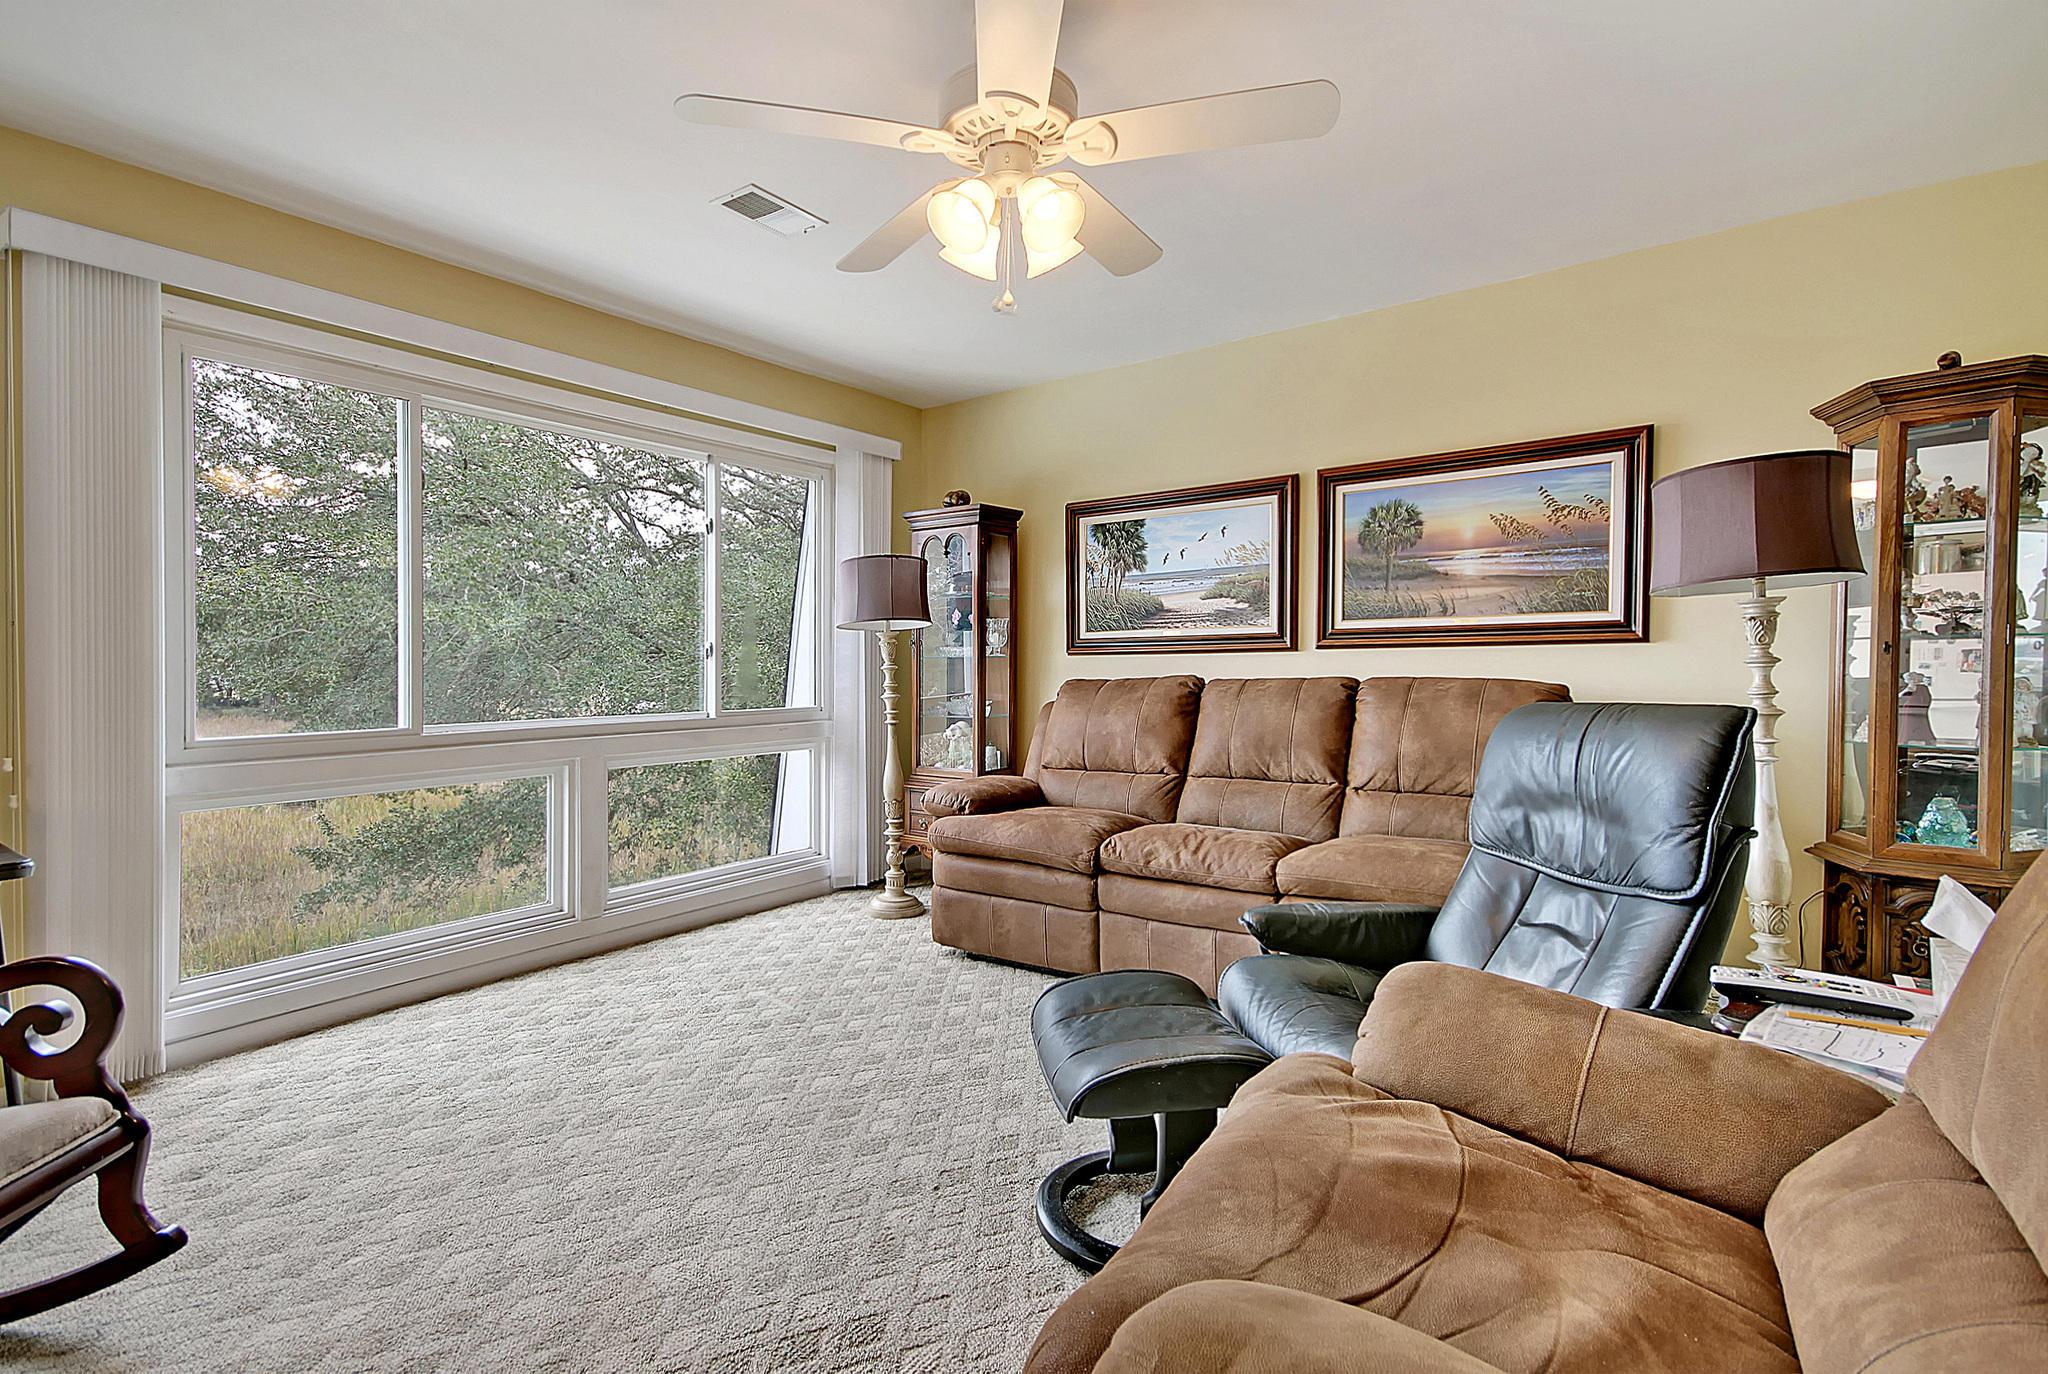 Lawton Bluff Homes For Sale - 608 Shore, Charleston, SC - 7